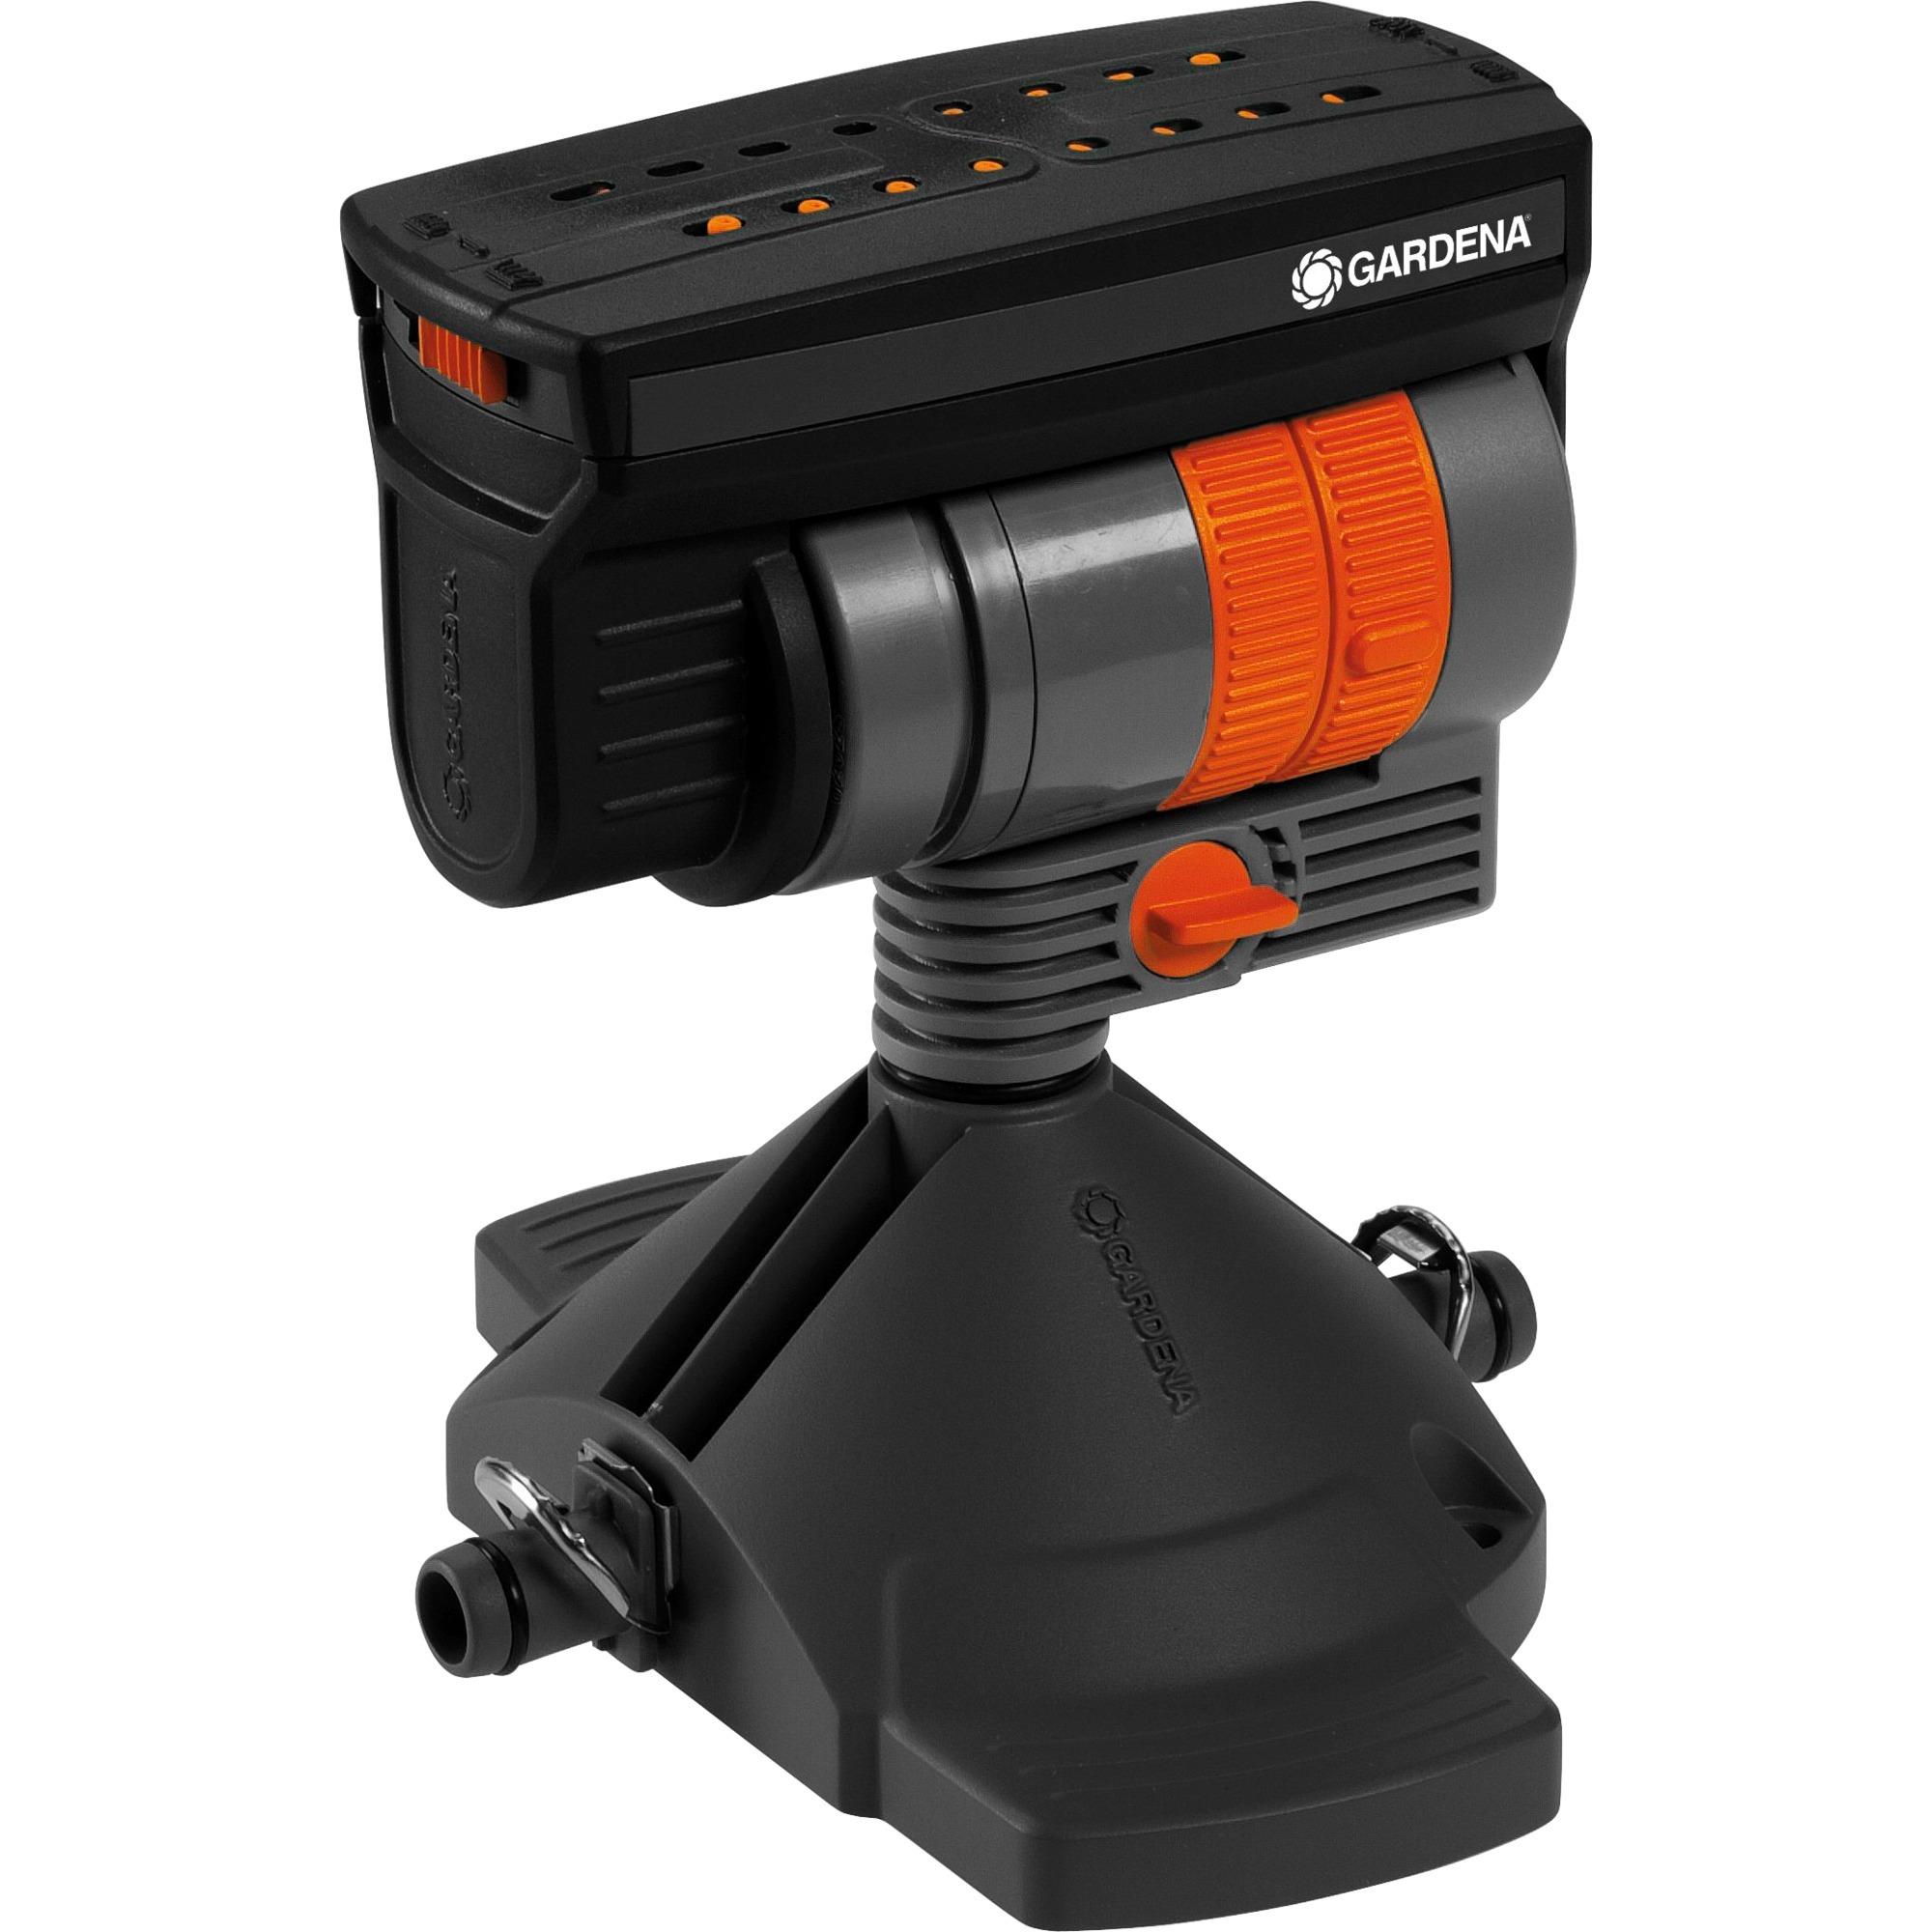 viereckregner-os-90-8361-sprinkleranlag